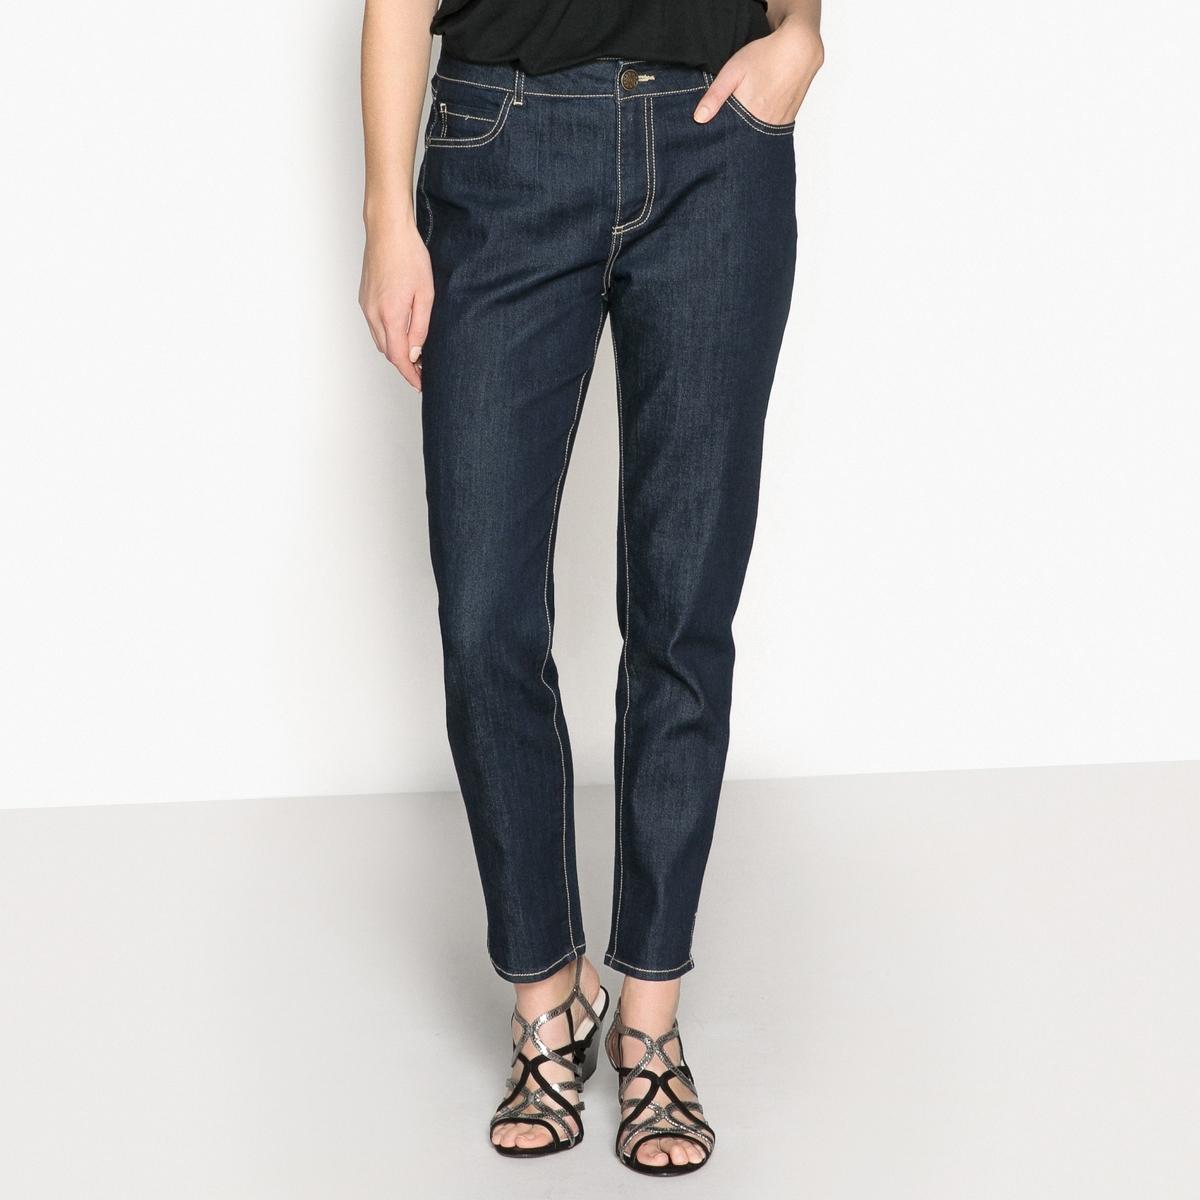 Jeans slim, 7/8, efeito push-up